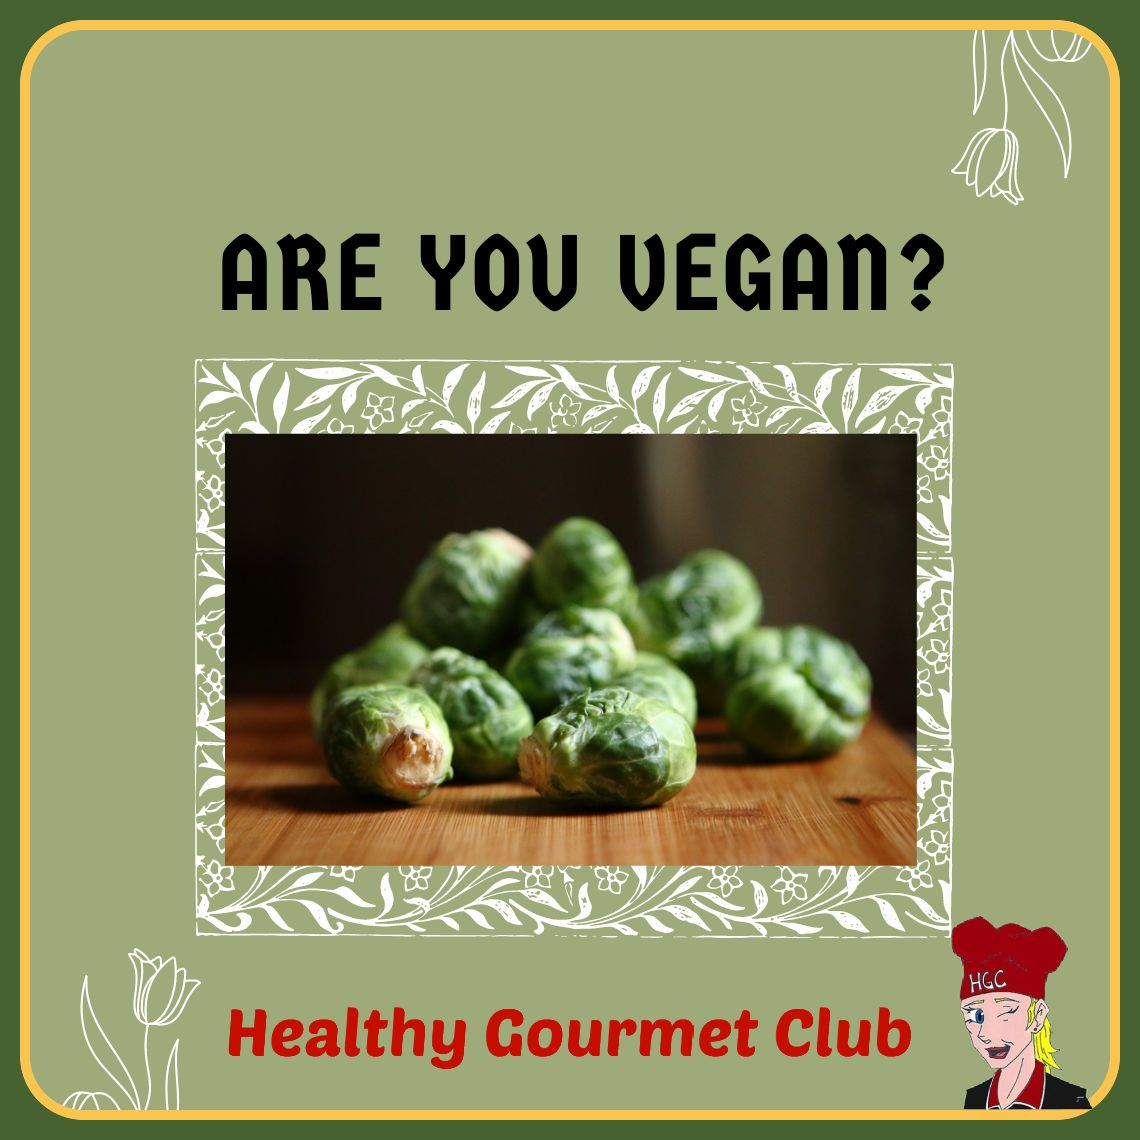 Love new #Vegan #HealthyRecipes  #Spartan Race  #Fitness #Organic